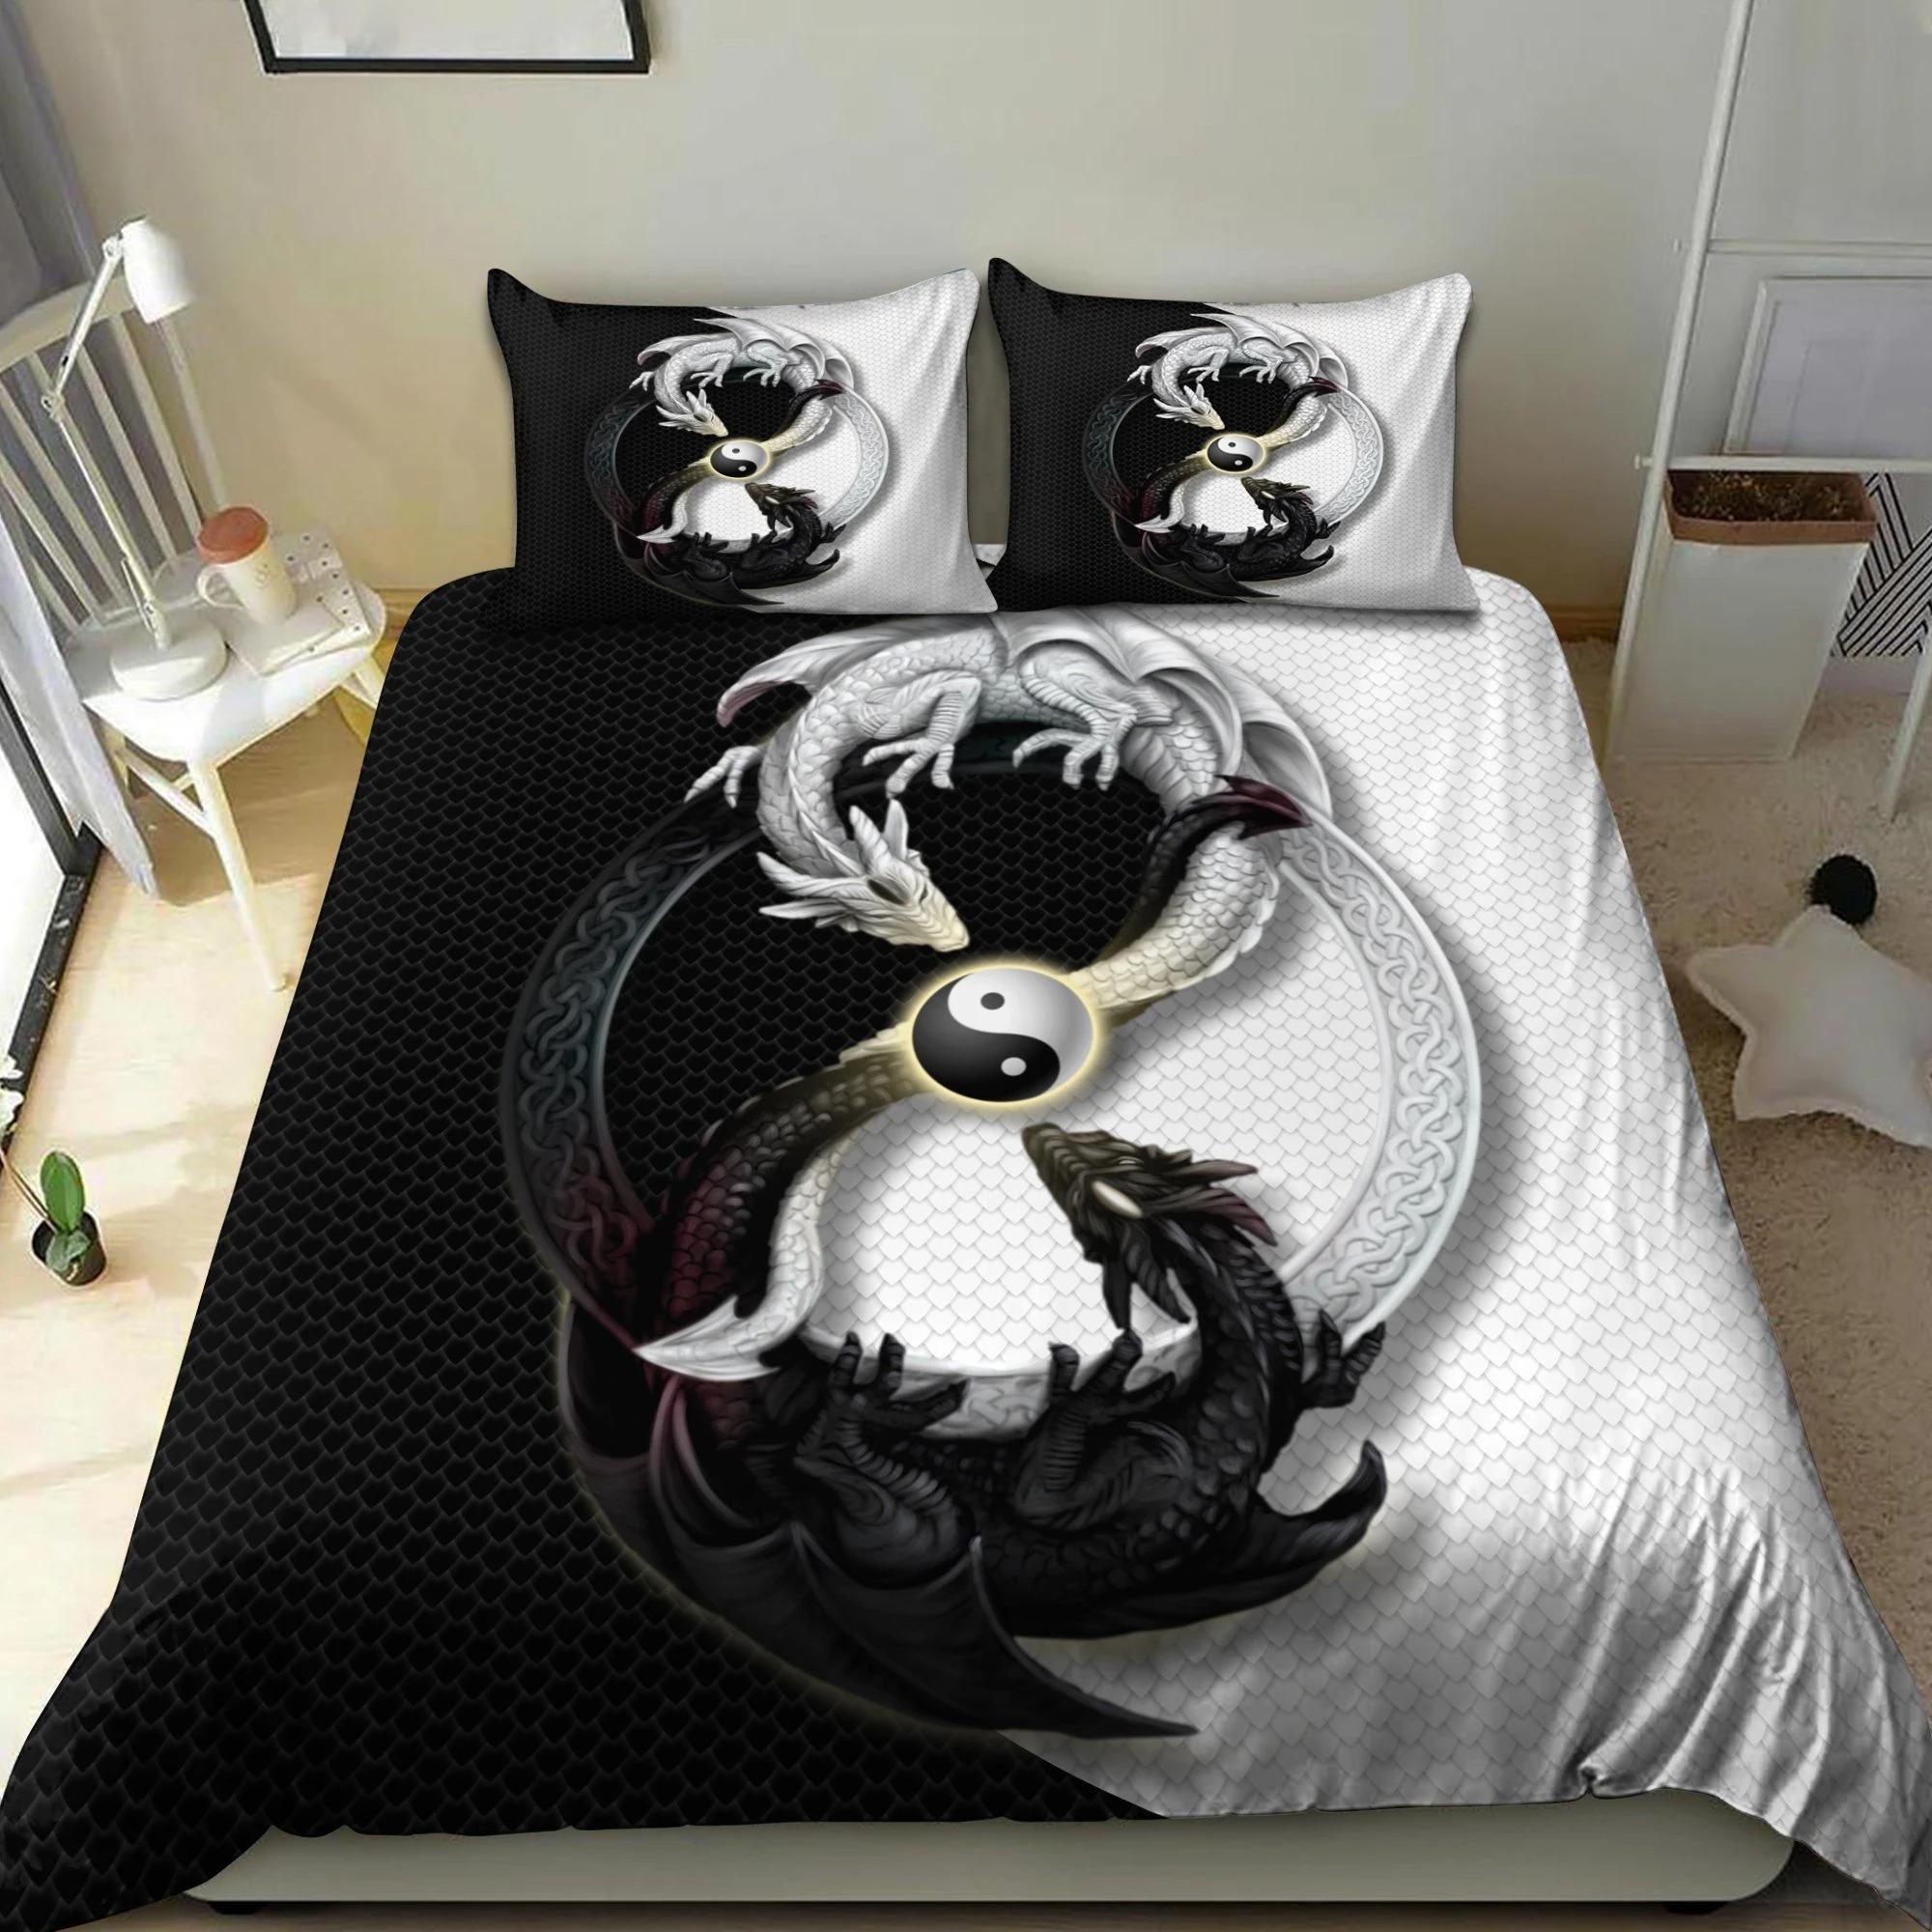 Dragon yin and yang bedding set2